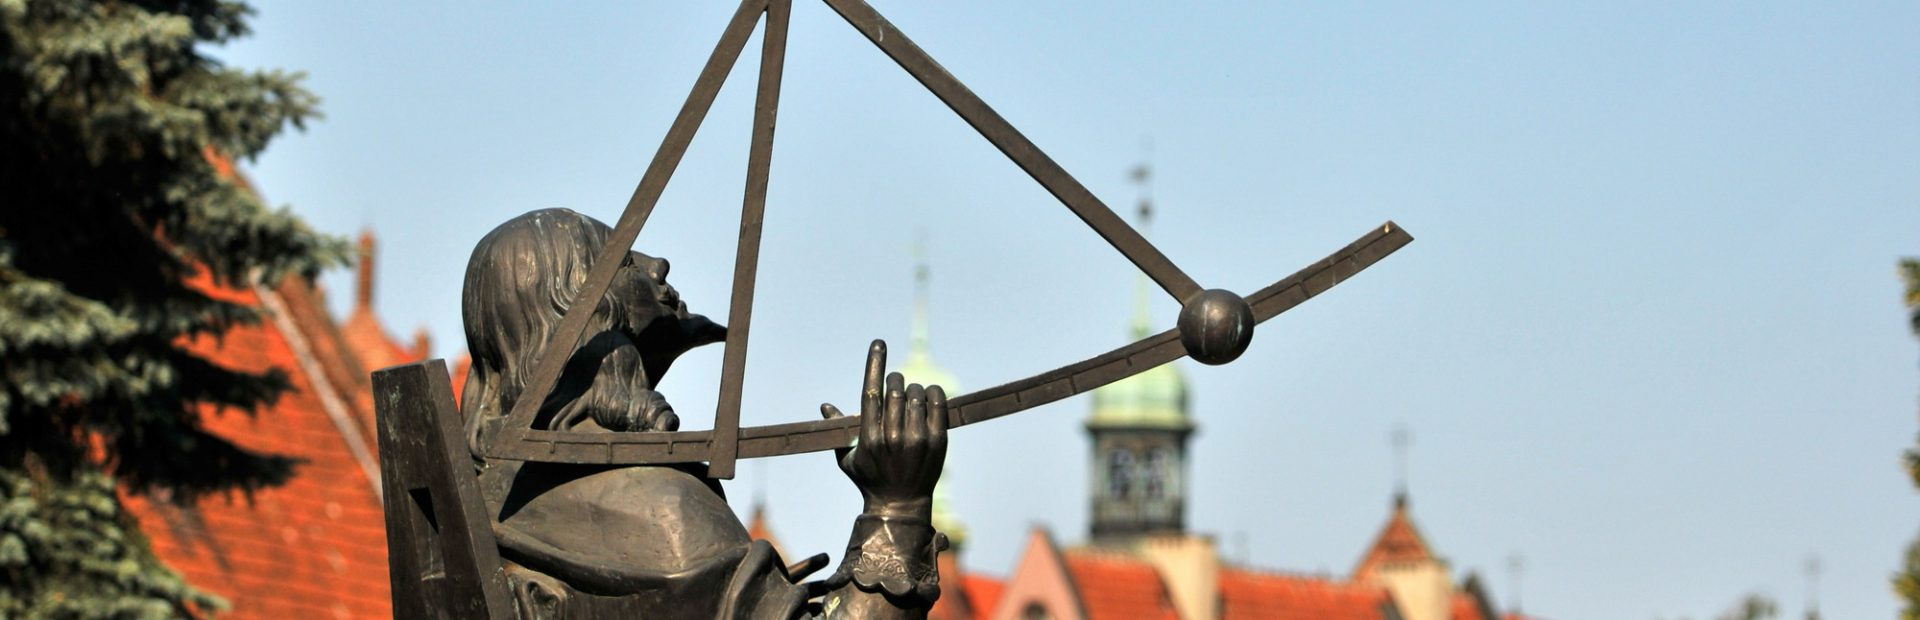 Hewelius Telescope, Polish Da Vinci lived in Gdansk